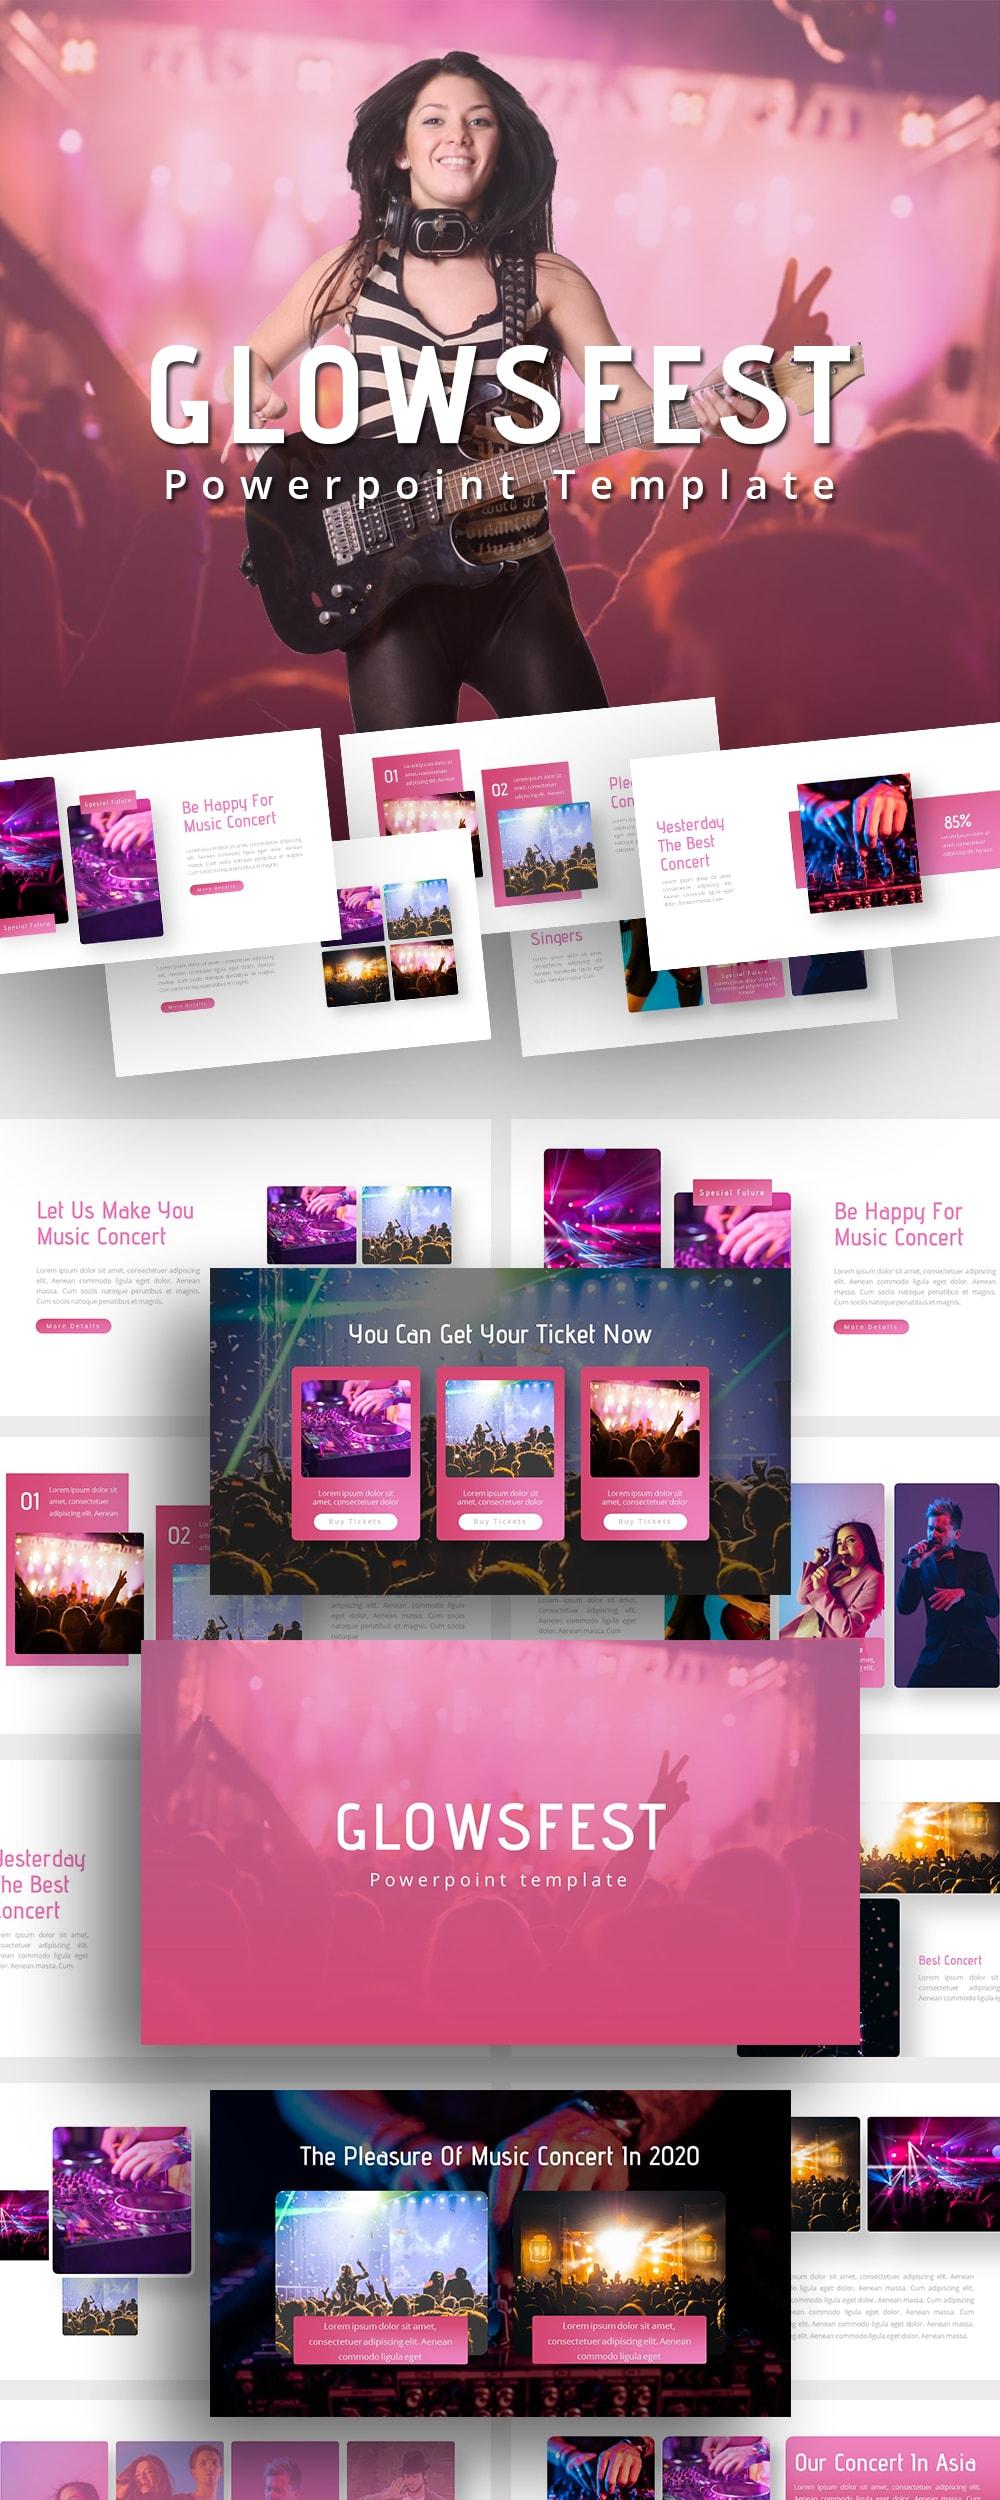 Free Glowsfest Music PowerPoint